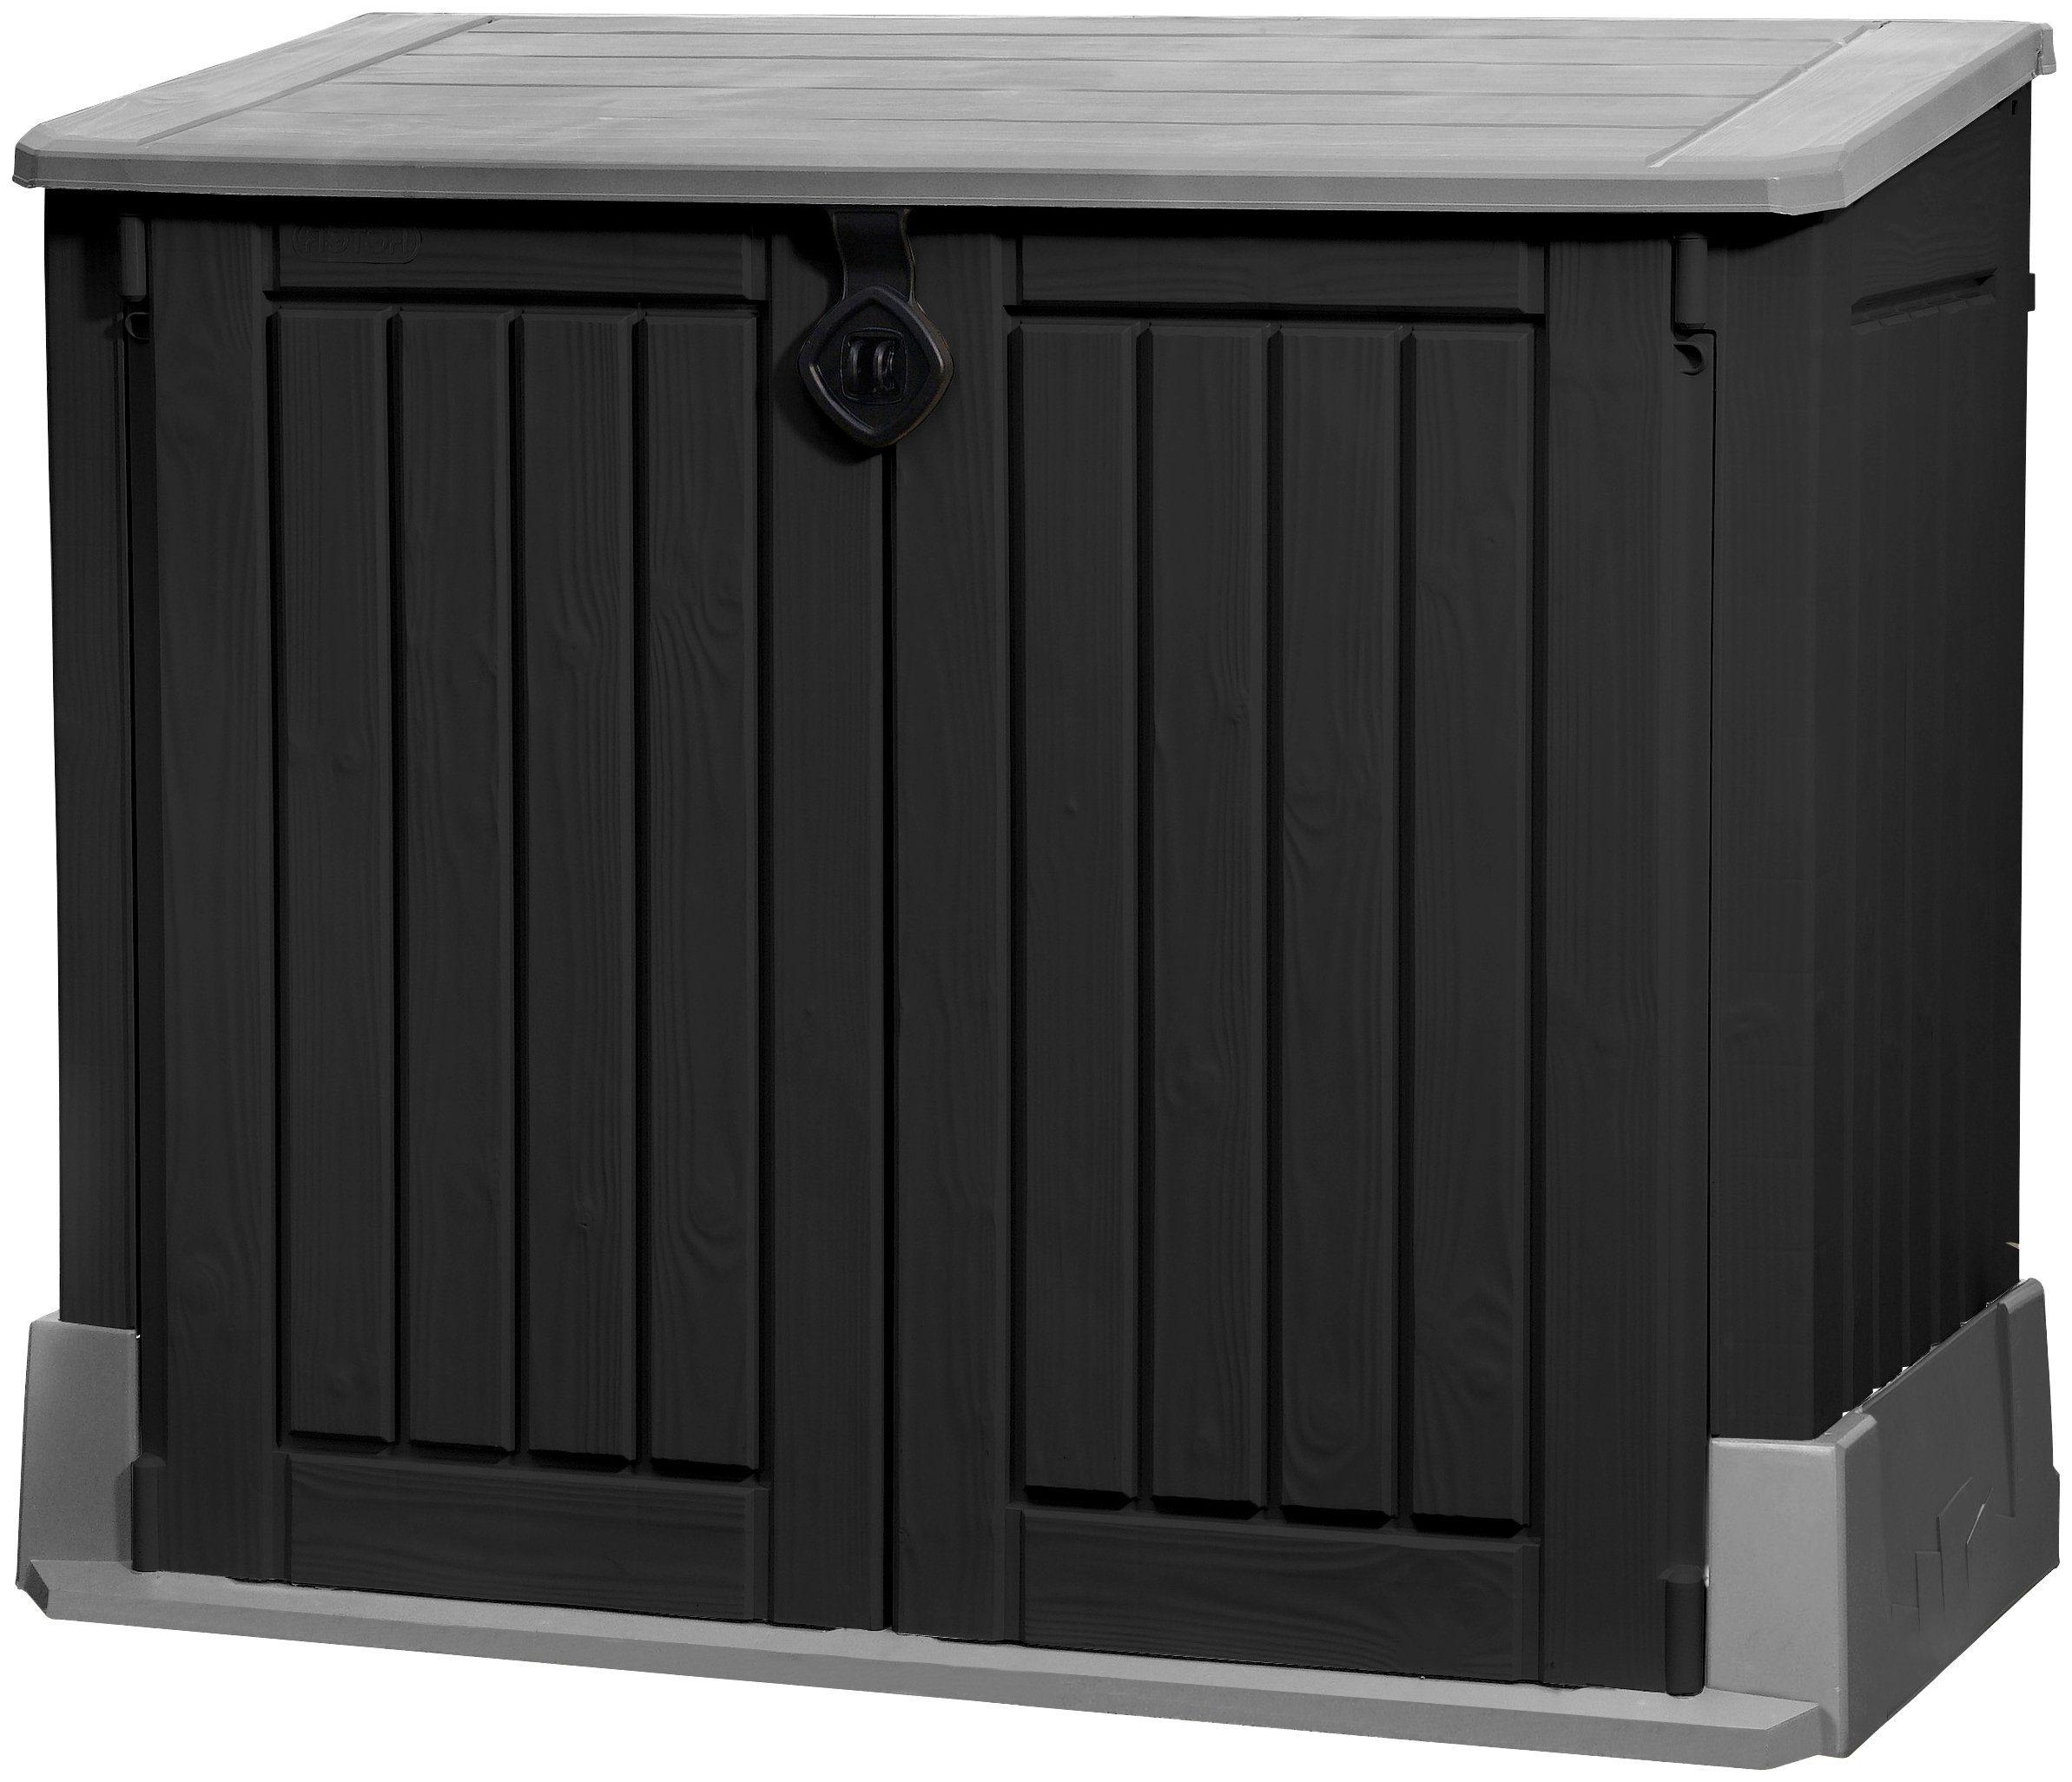 KETER Mülltonnenbox »Store It Out MIDI«, für 2x120 l, BxTxH: 130x110x74 cm